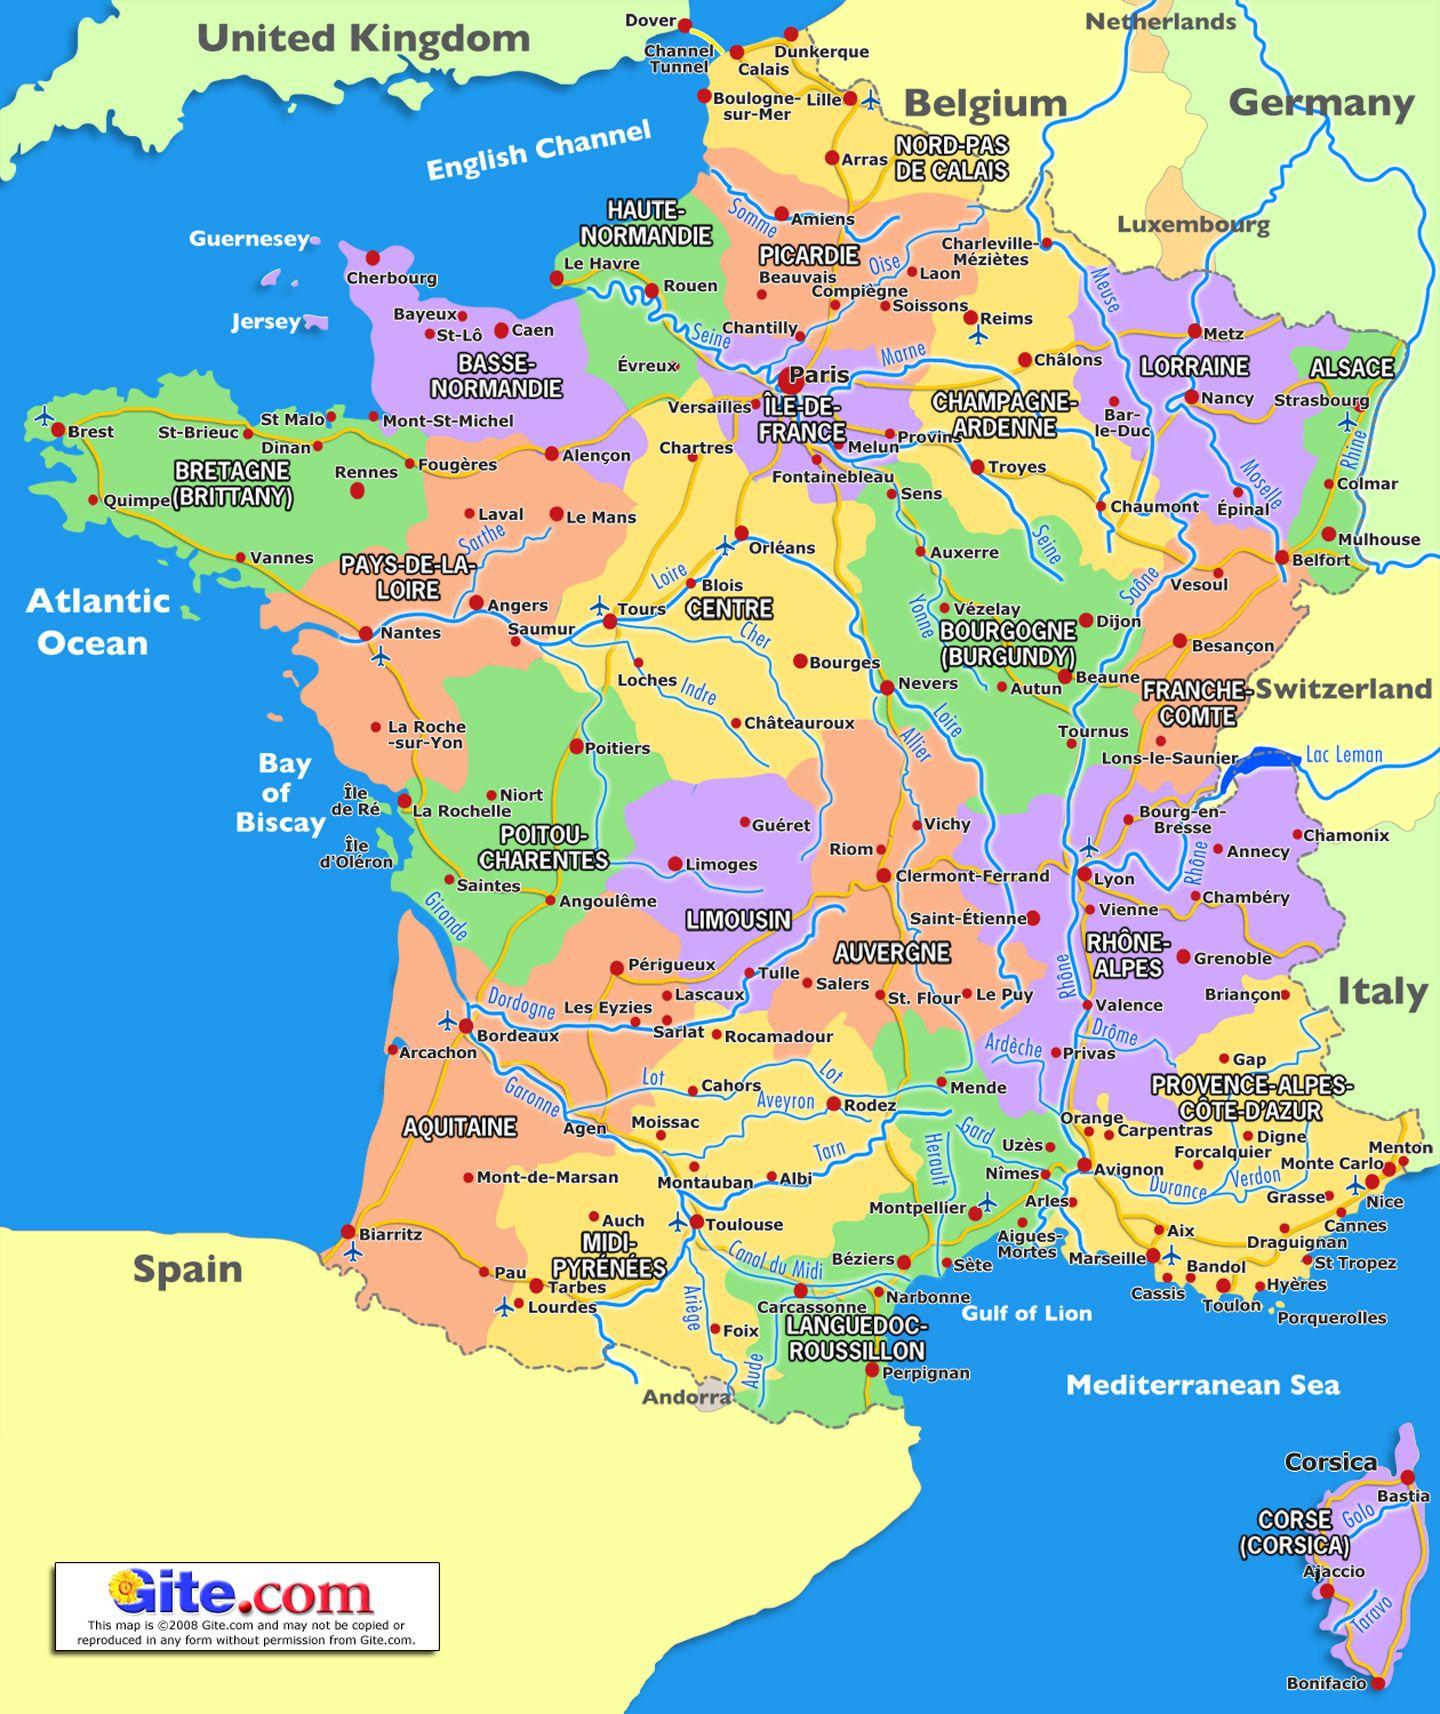 Dorogone Region Of France